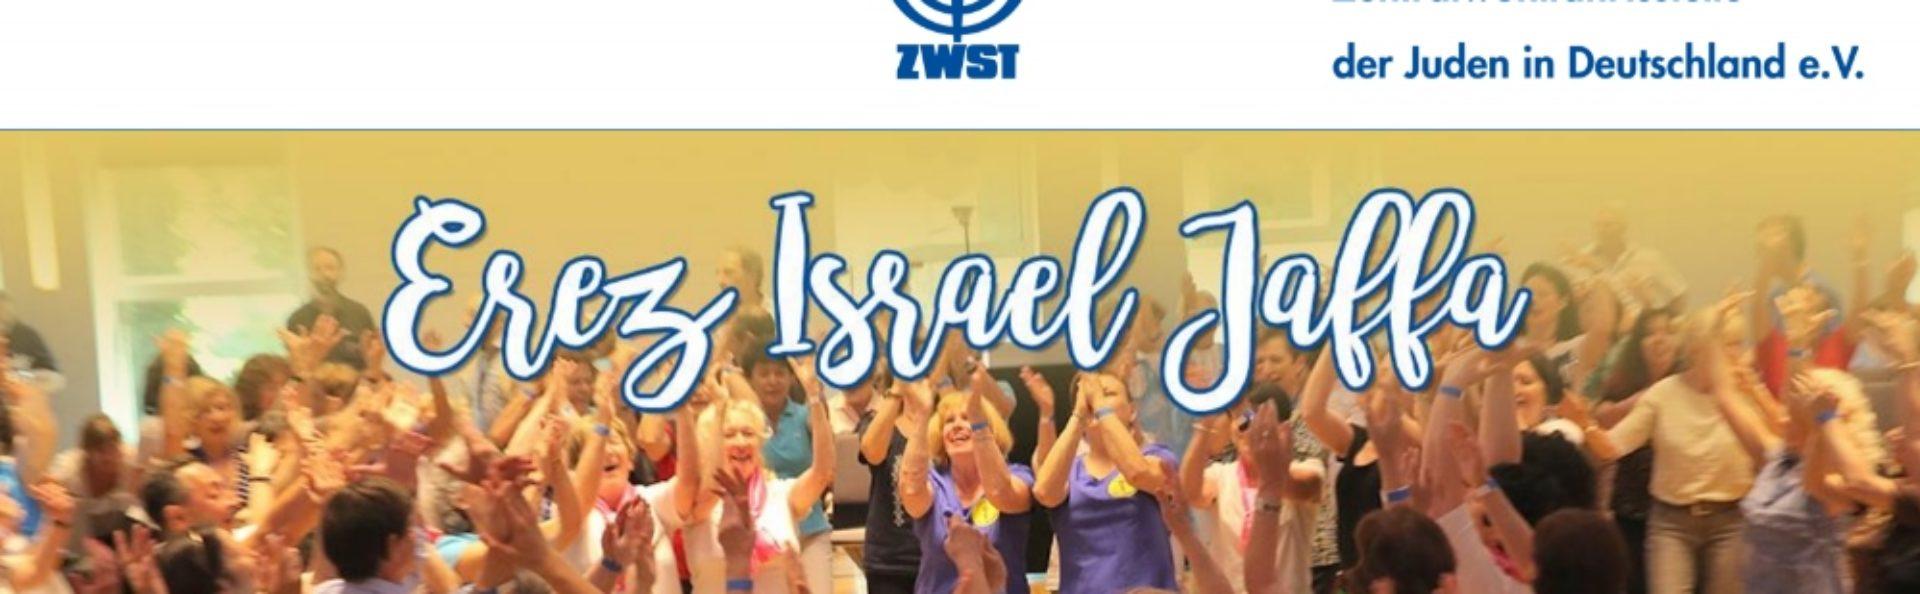 "Tanzfestival ""Erez Israel Jaffa"" am 23.06.2019 in Frankfurt am Main"